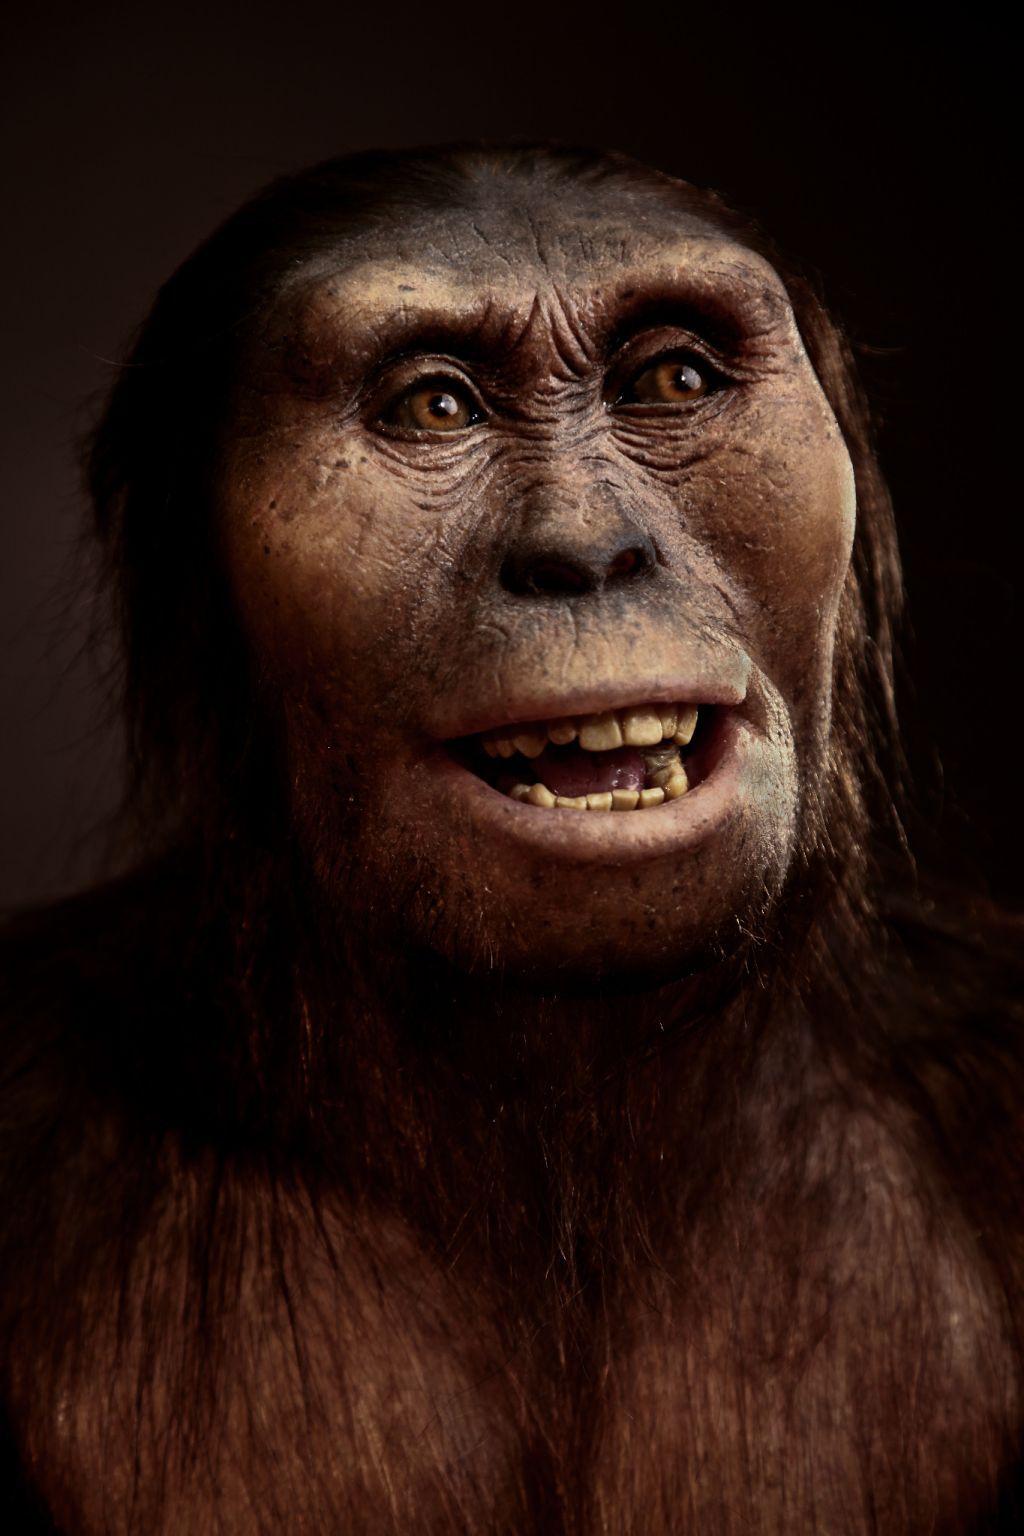 Lucy Australopitecus Afarensis An Extinct Hominid That